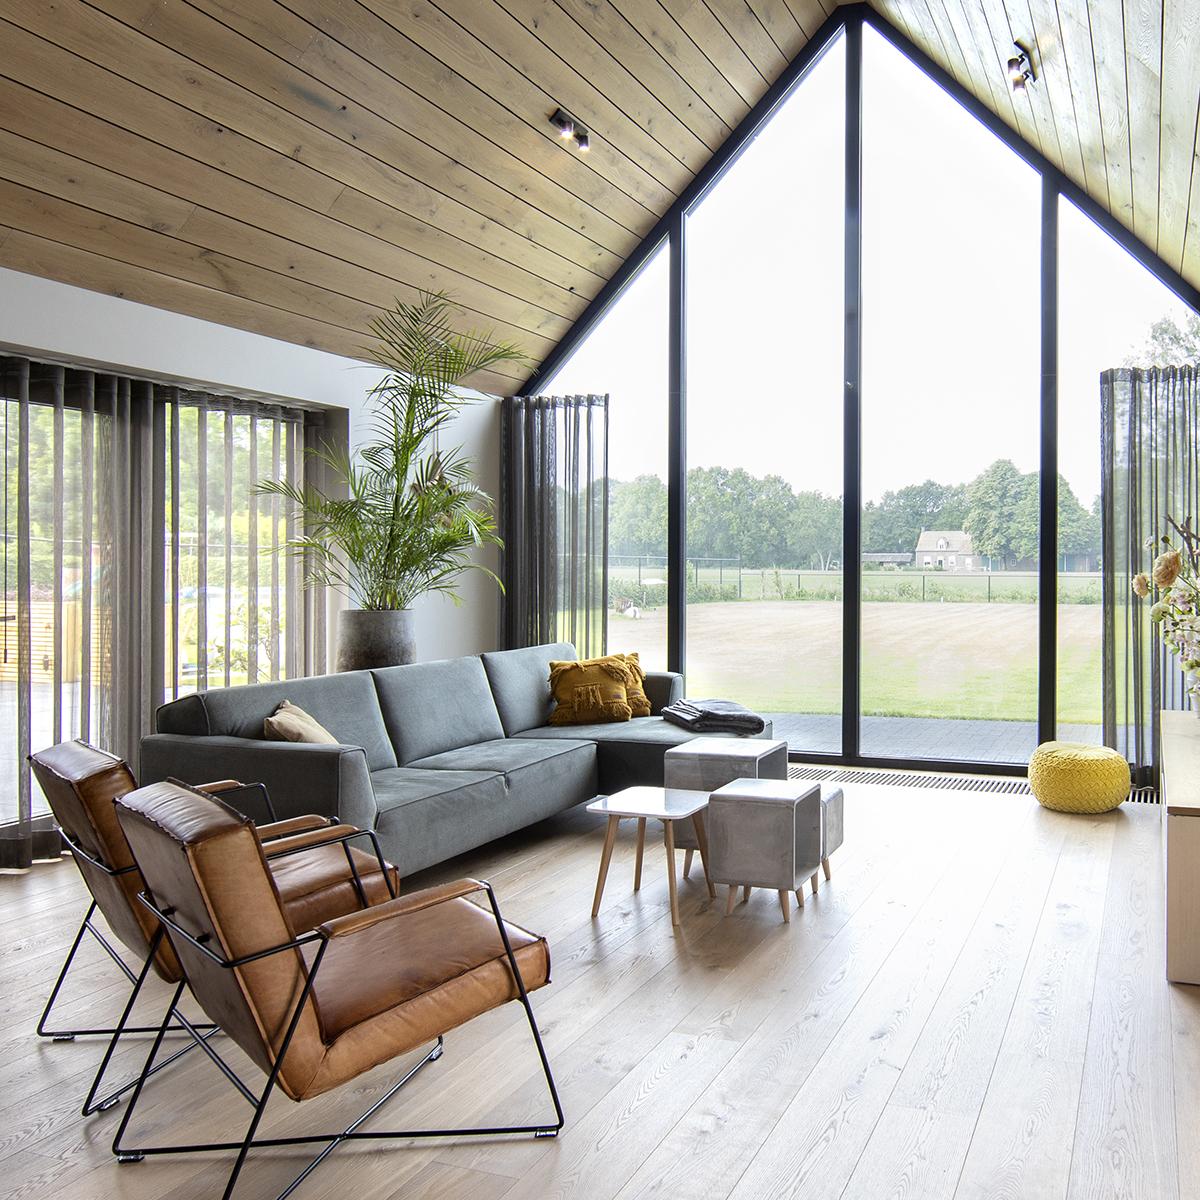 Nieuwbouw woning Zeeland